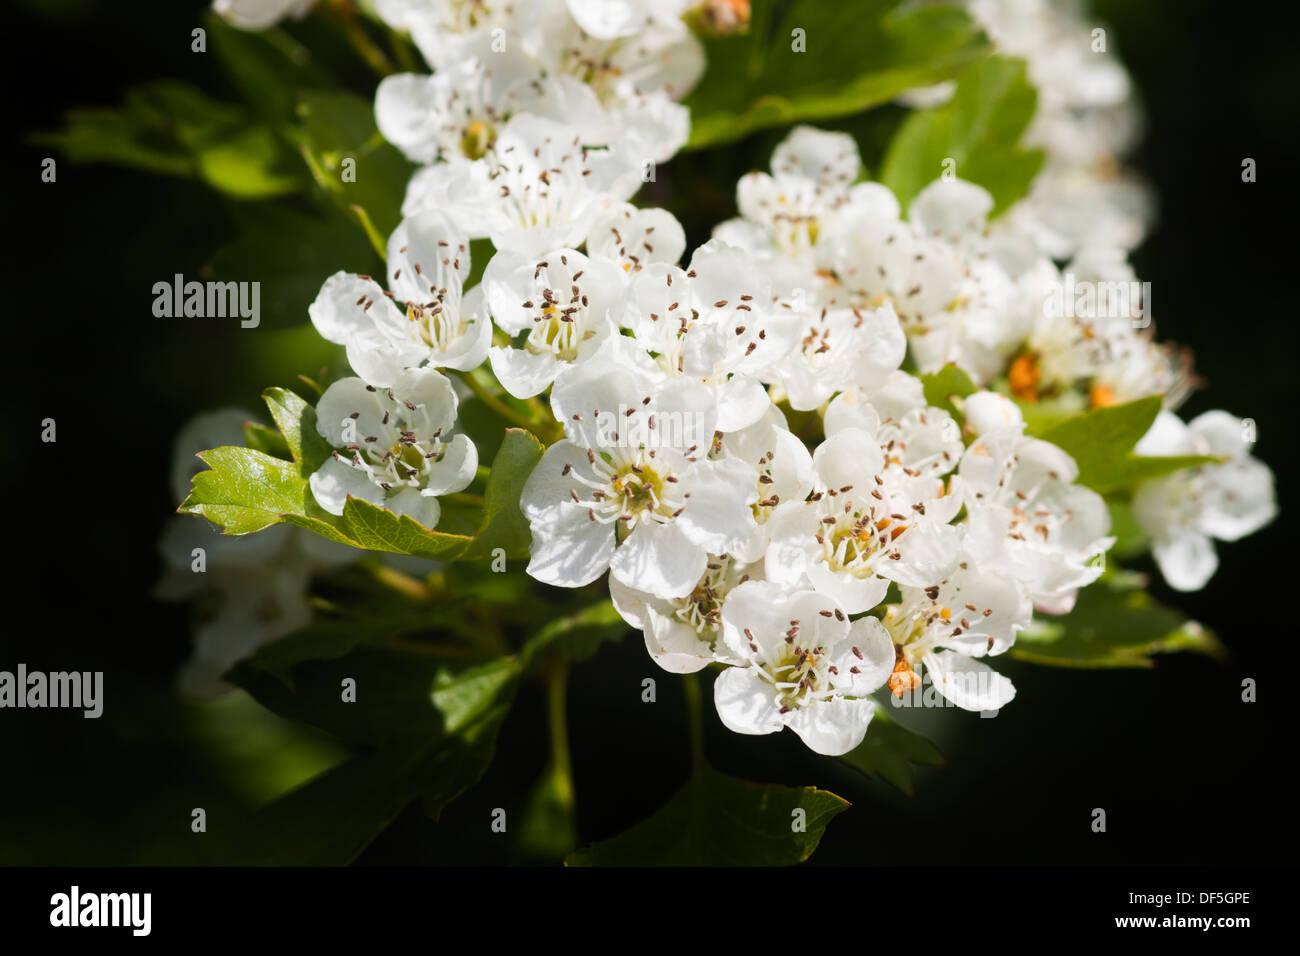 White Hawthorne Flower Stock Photos & White Hawthorne